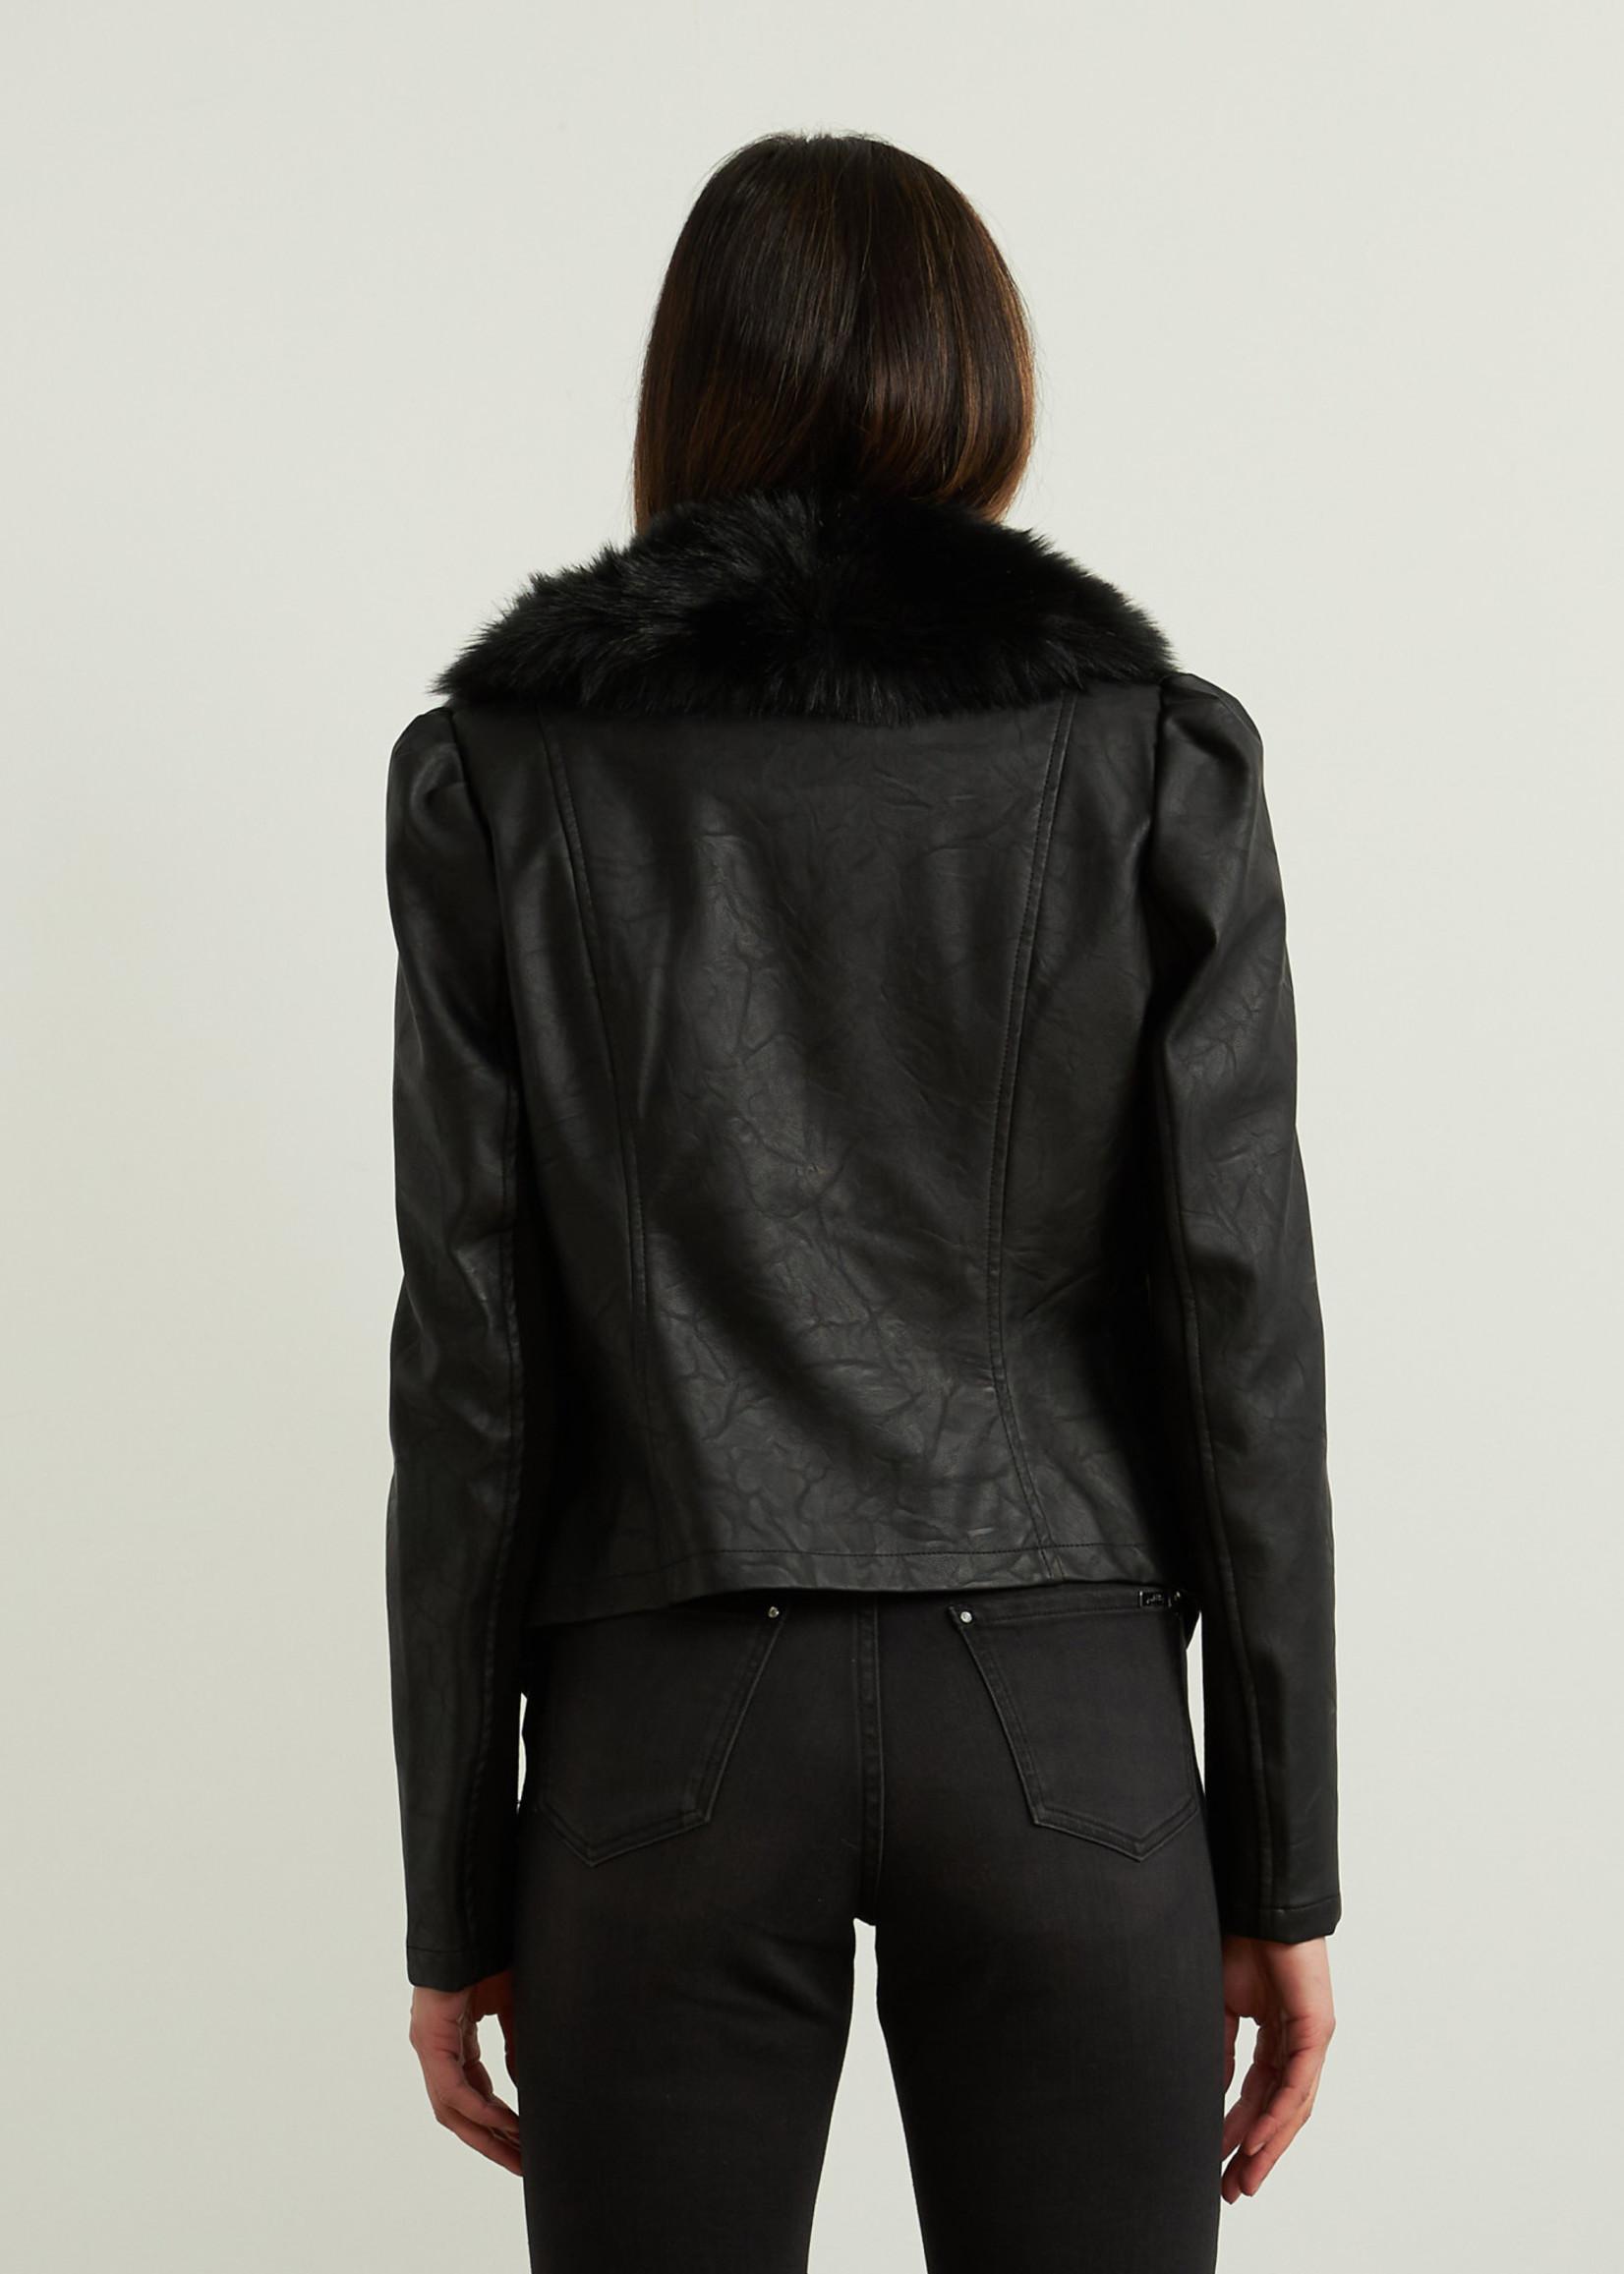 Joseph Ribkoff Joseph Ribkoff  Faux Fur Short Jacket